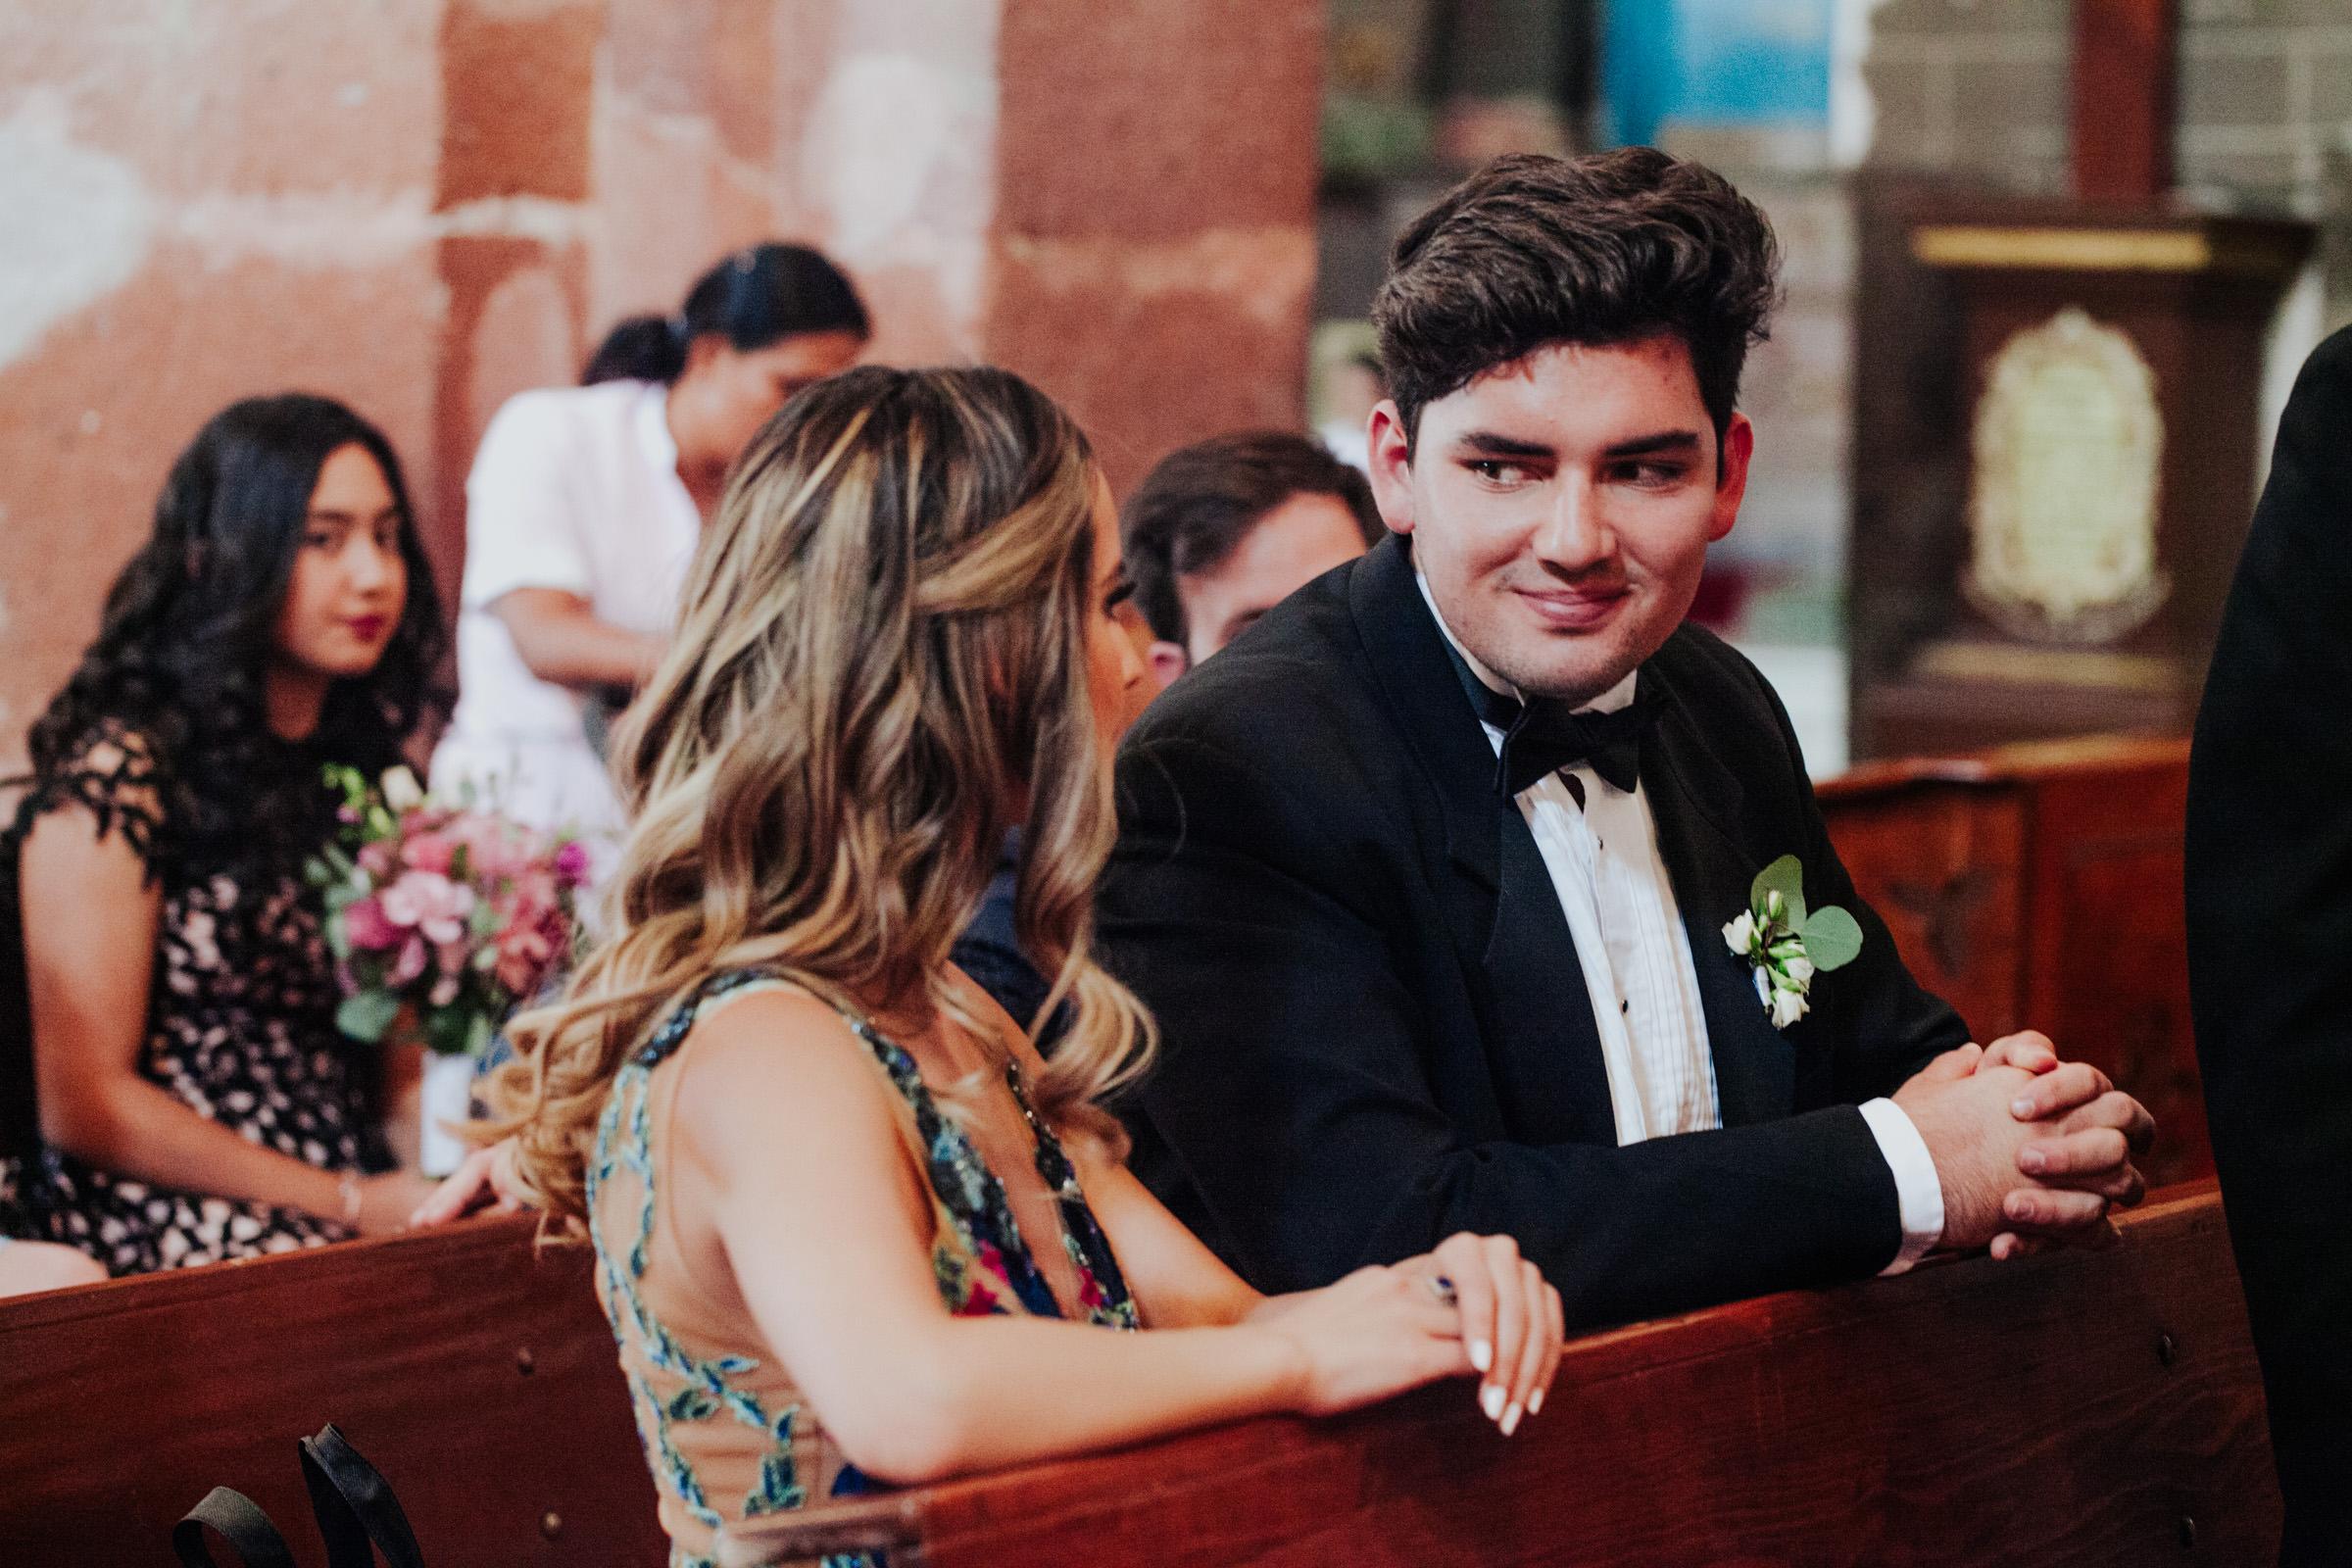 San-Miguel-de-Allende-Wedding-Photography-Parroquia-Instituto-Boda-Fotografia-Fer-Sergio-Pierce-Lifestyle-Photography0277.JPG